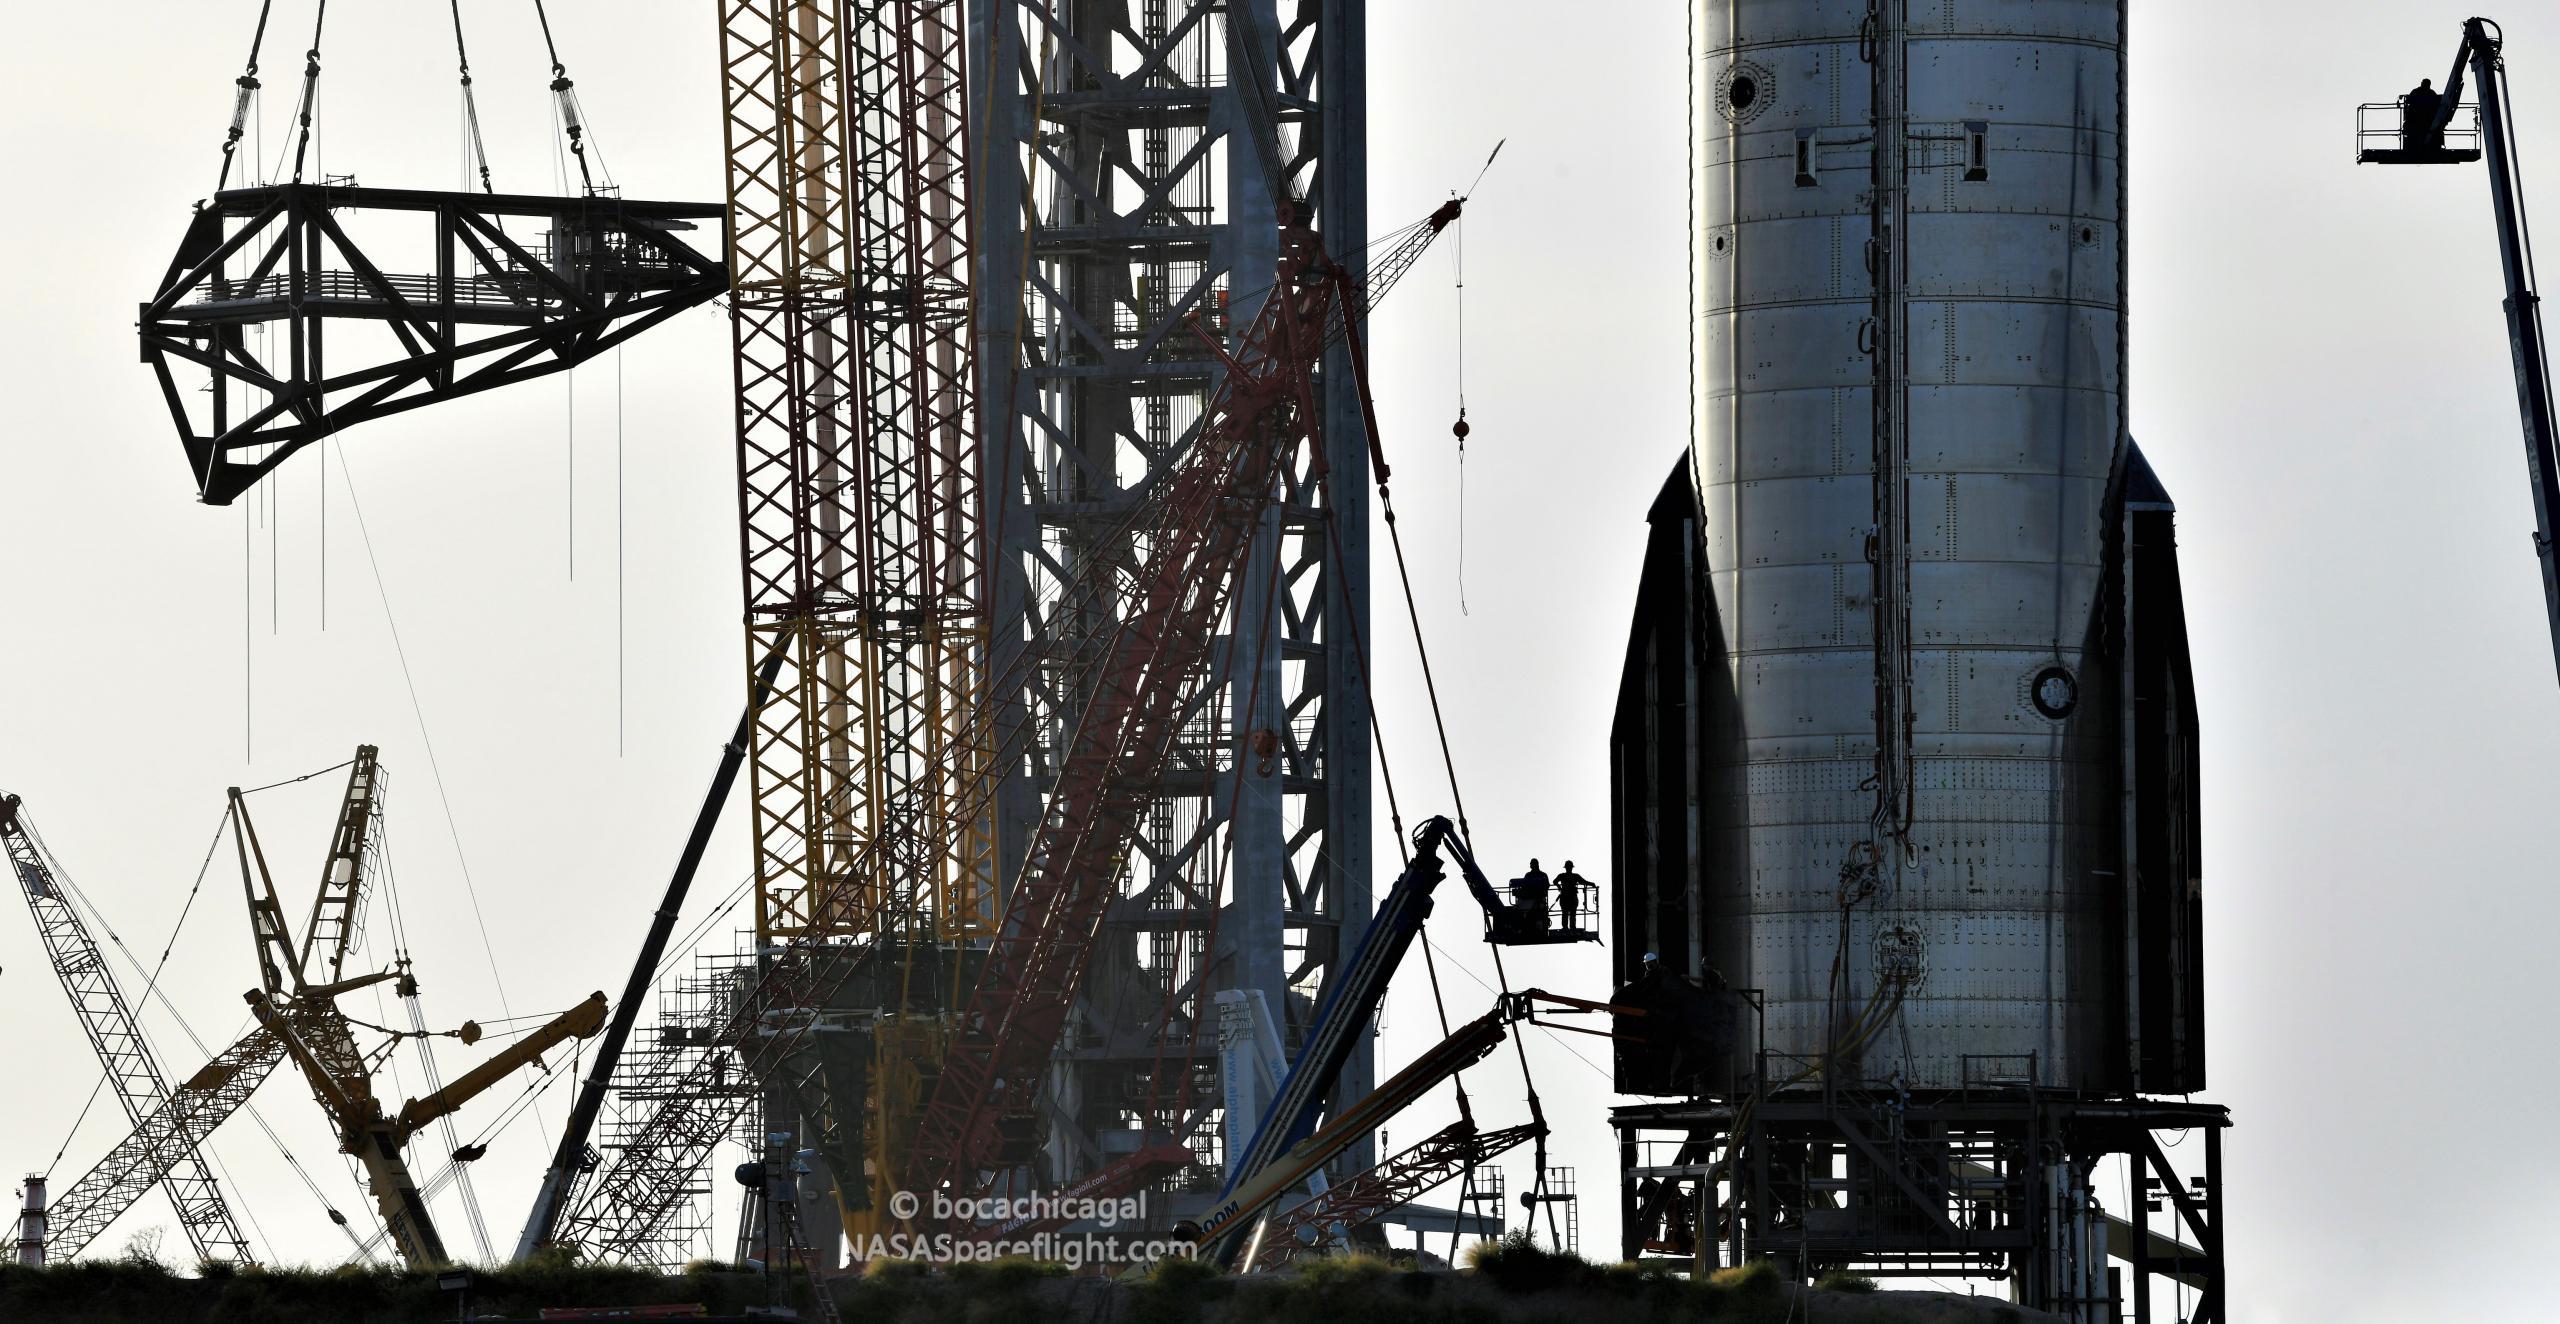 Starship Boca Chica 082921 (NASASpaceflight – bocachicagal) tower QD arm install + S20 2 crop (c)